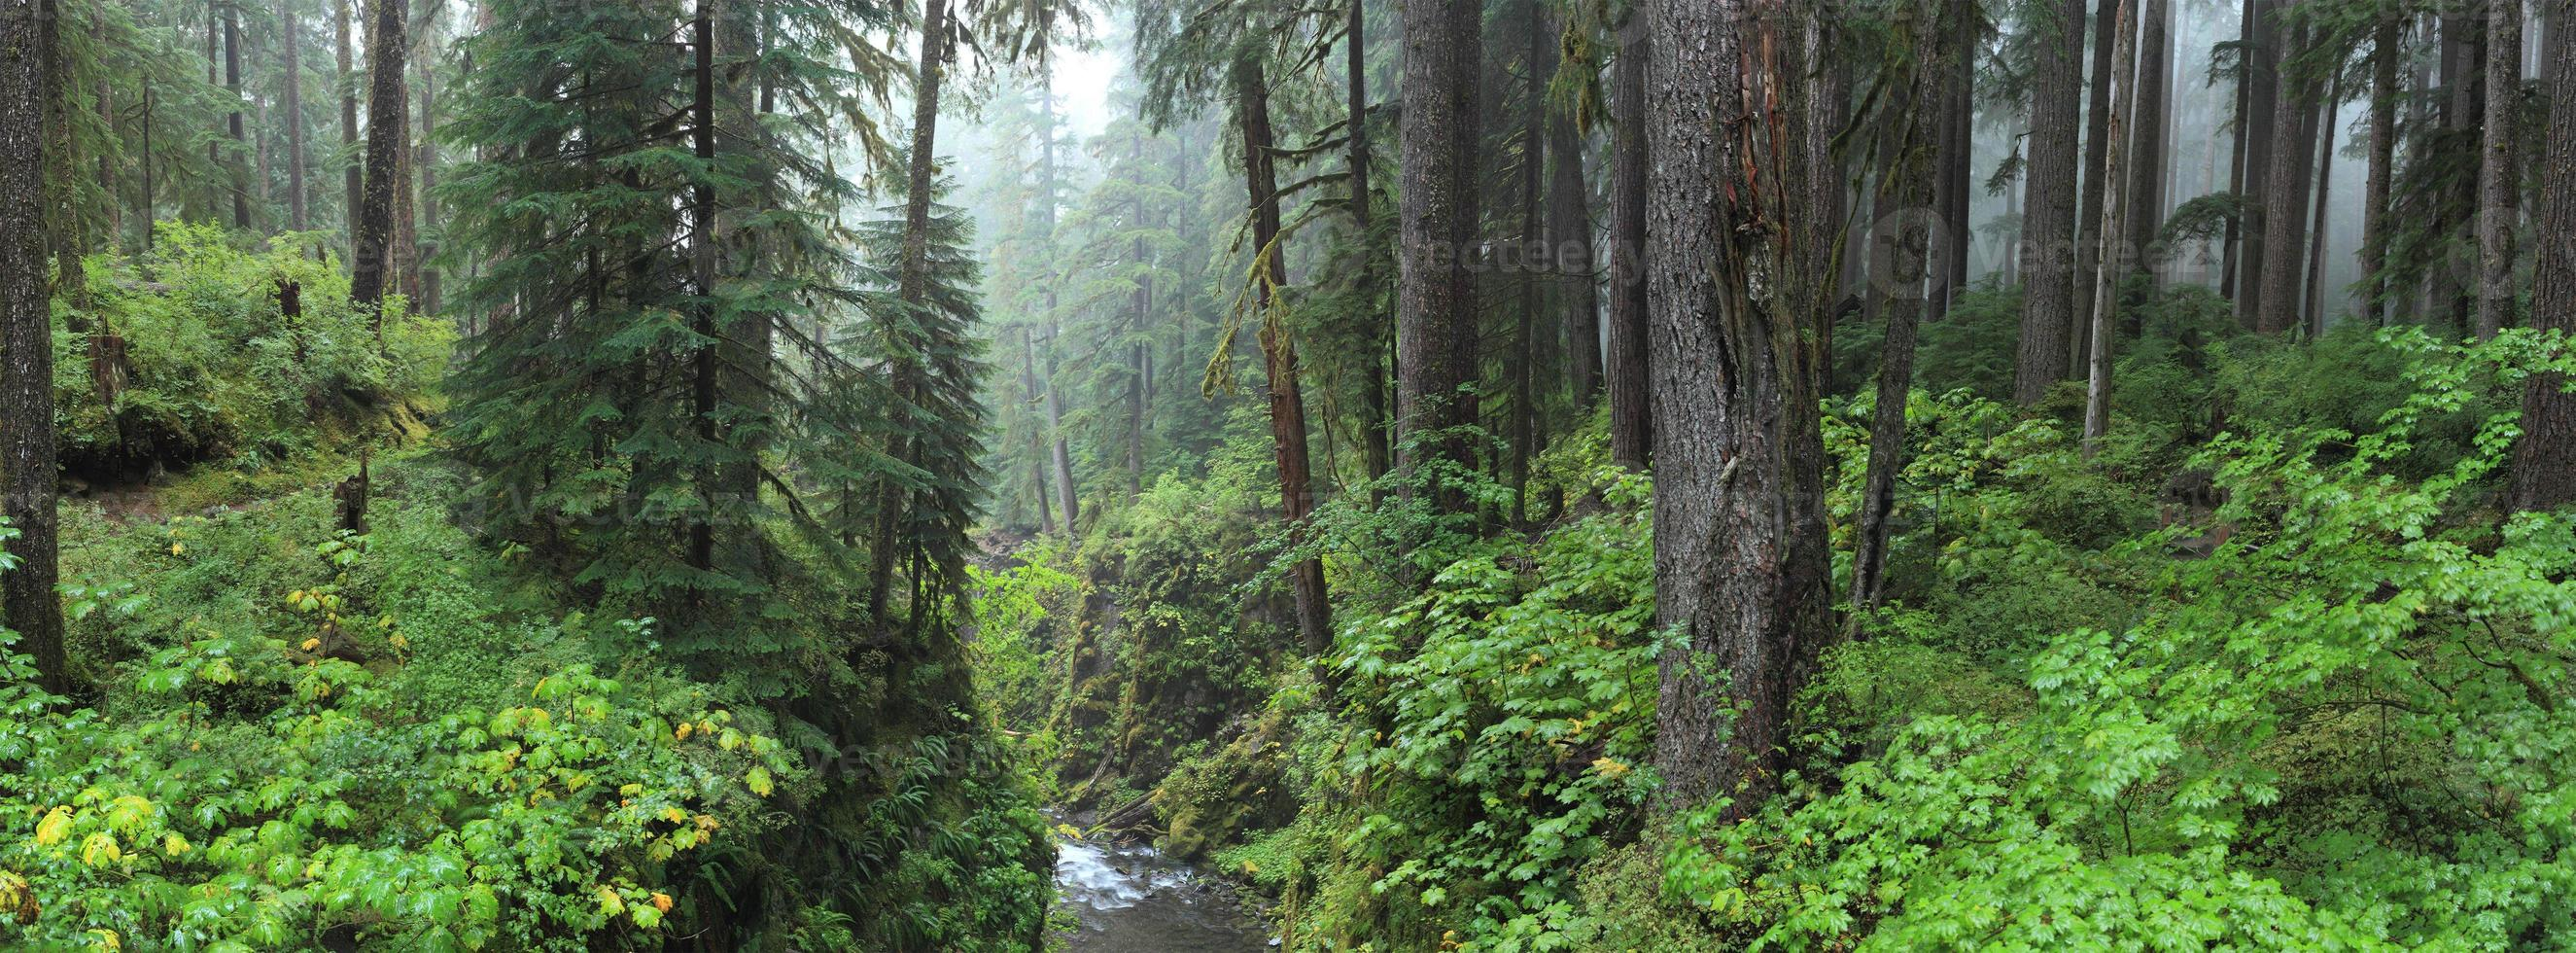 hoh rain forest foto